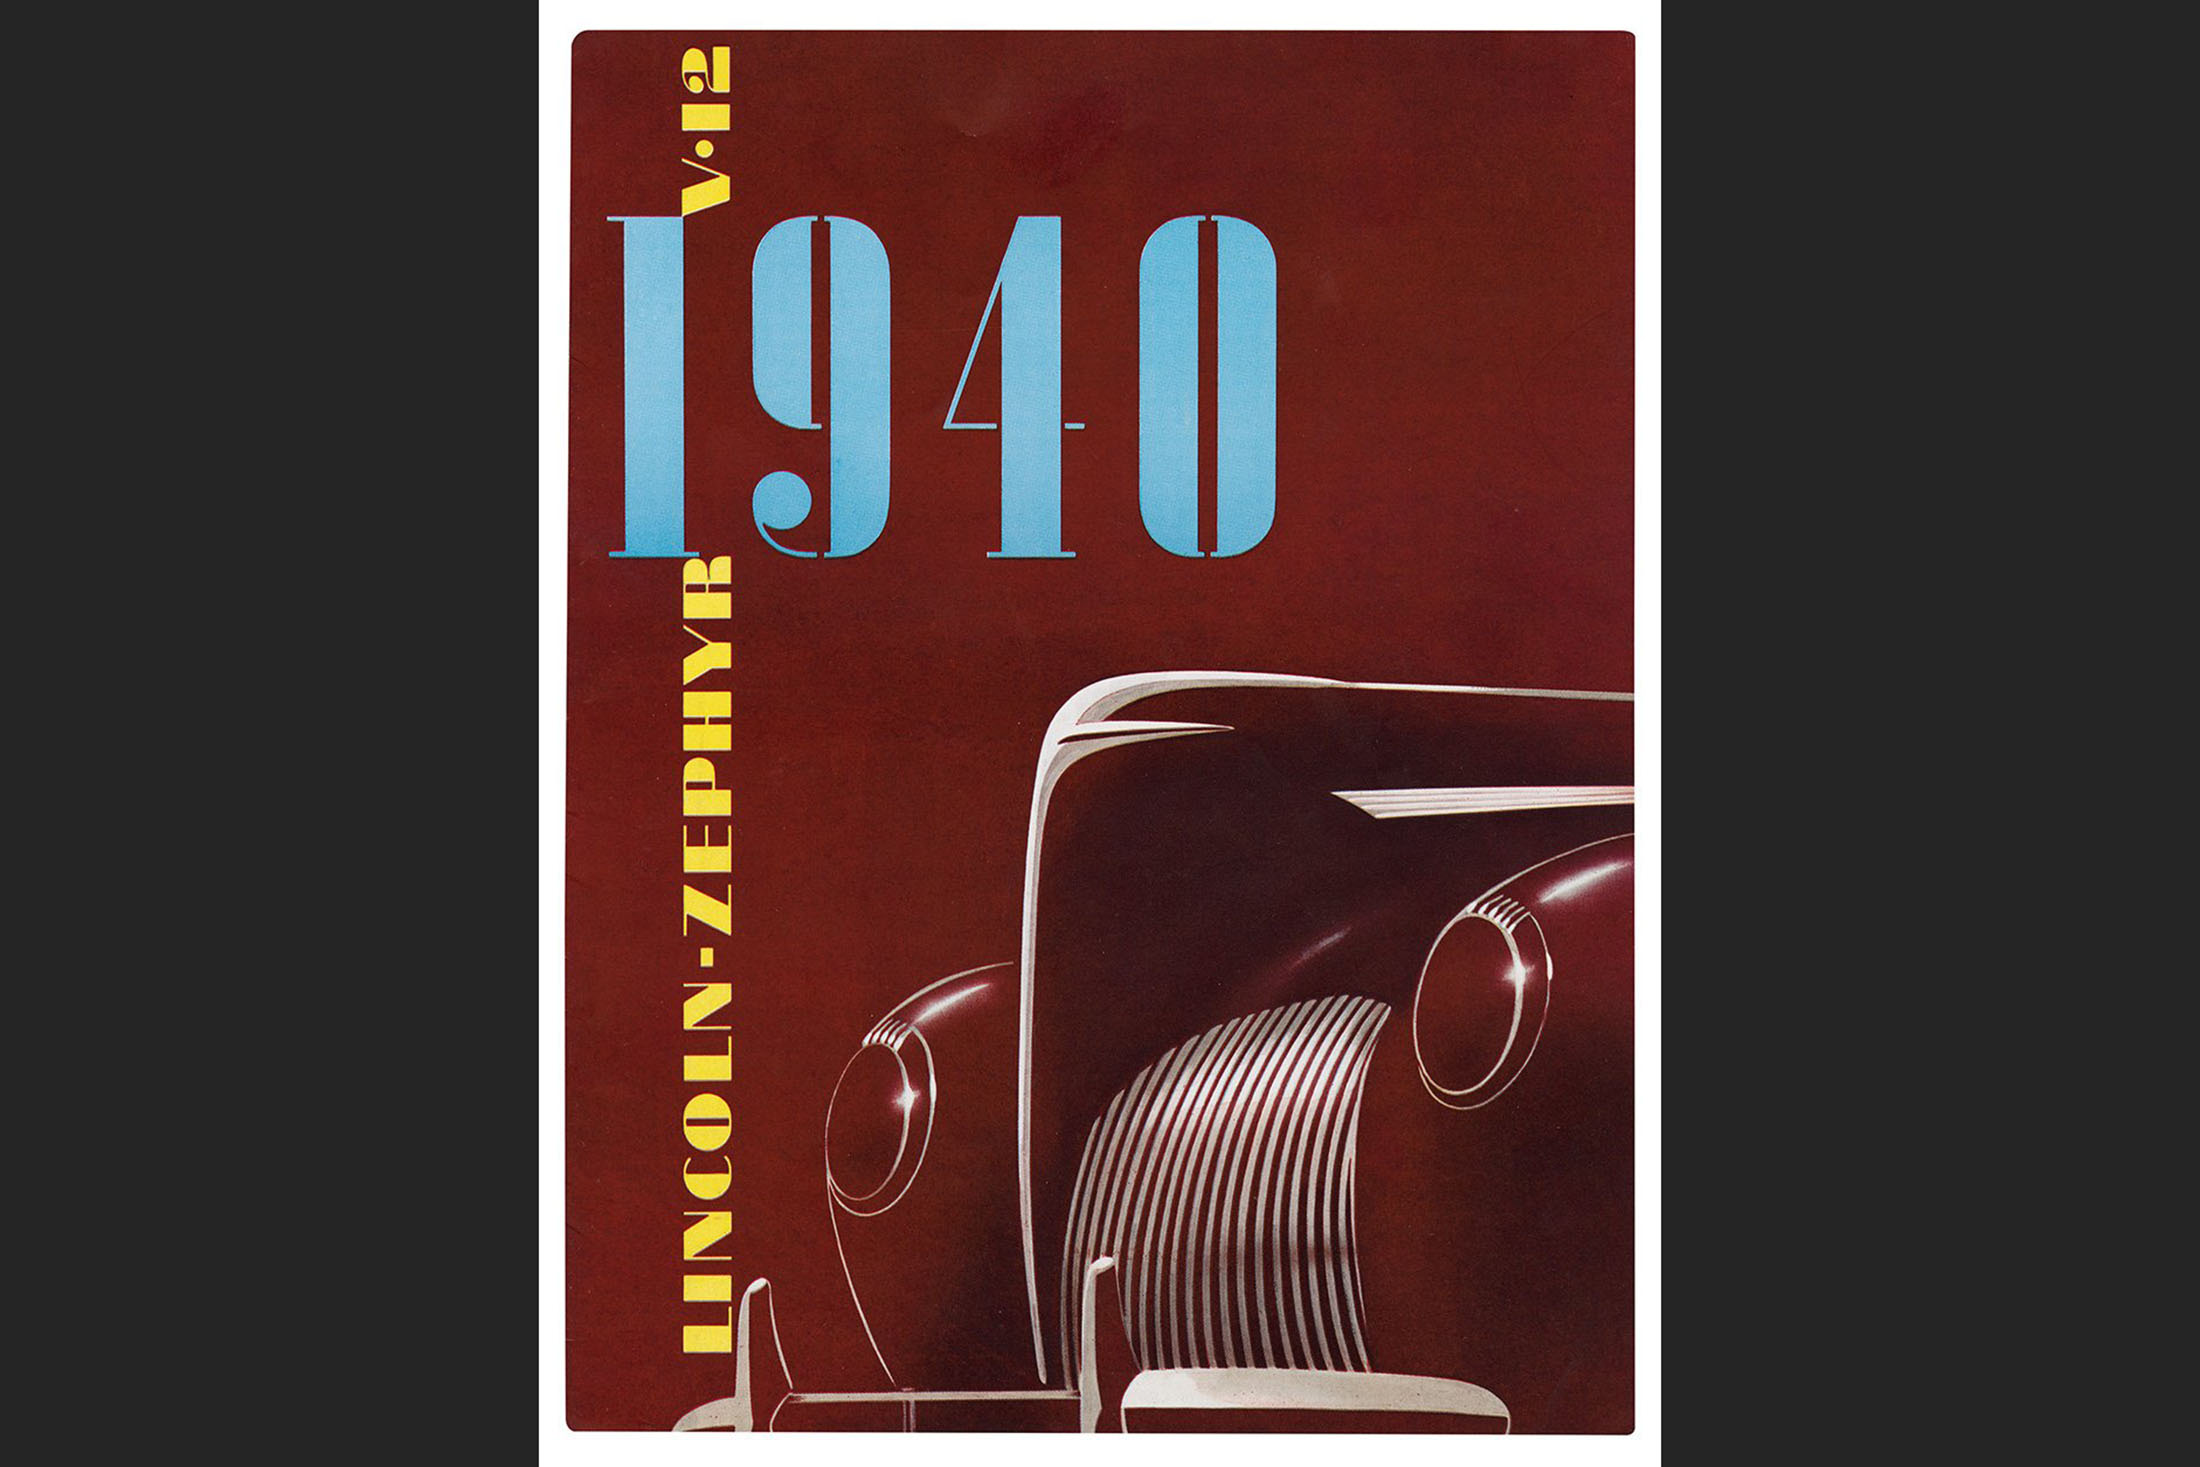 Lincoln-Zephyr, 1940